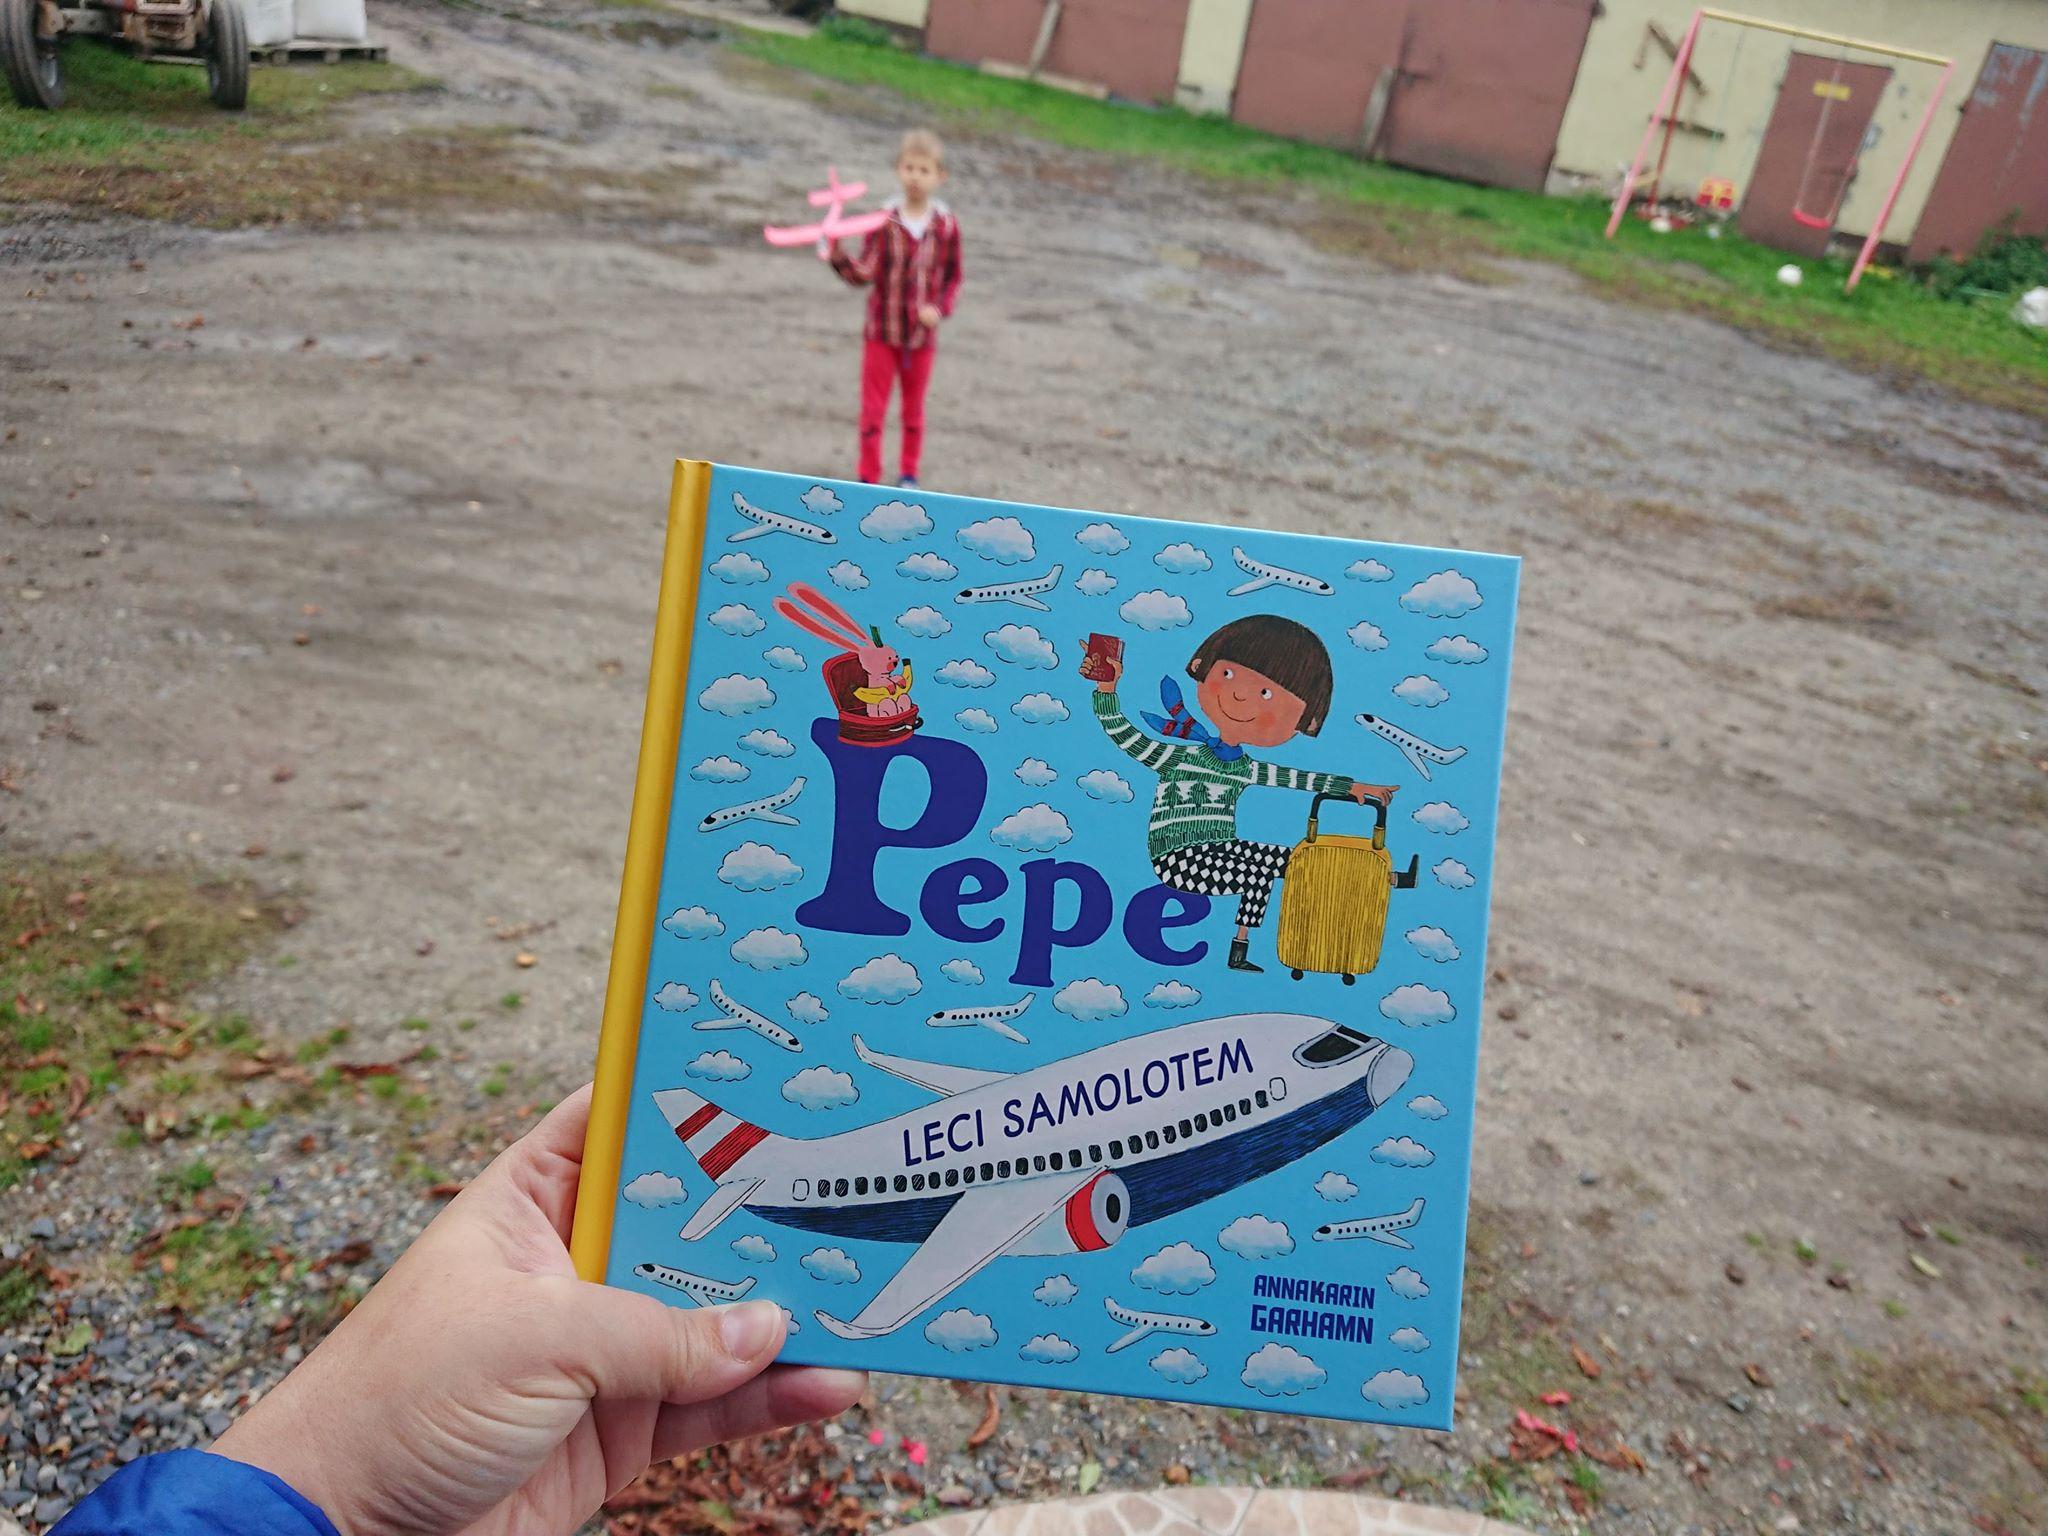 Pepe leci samolotem